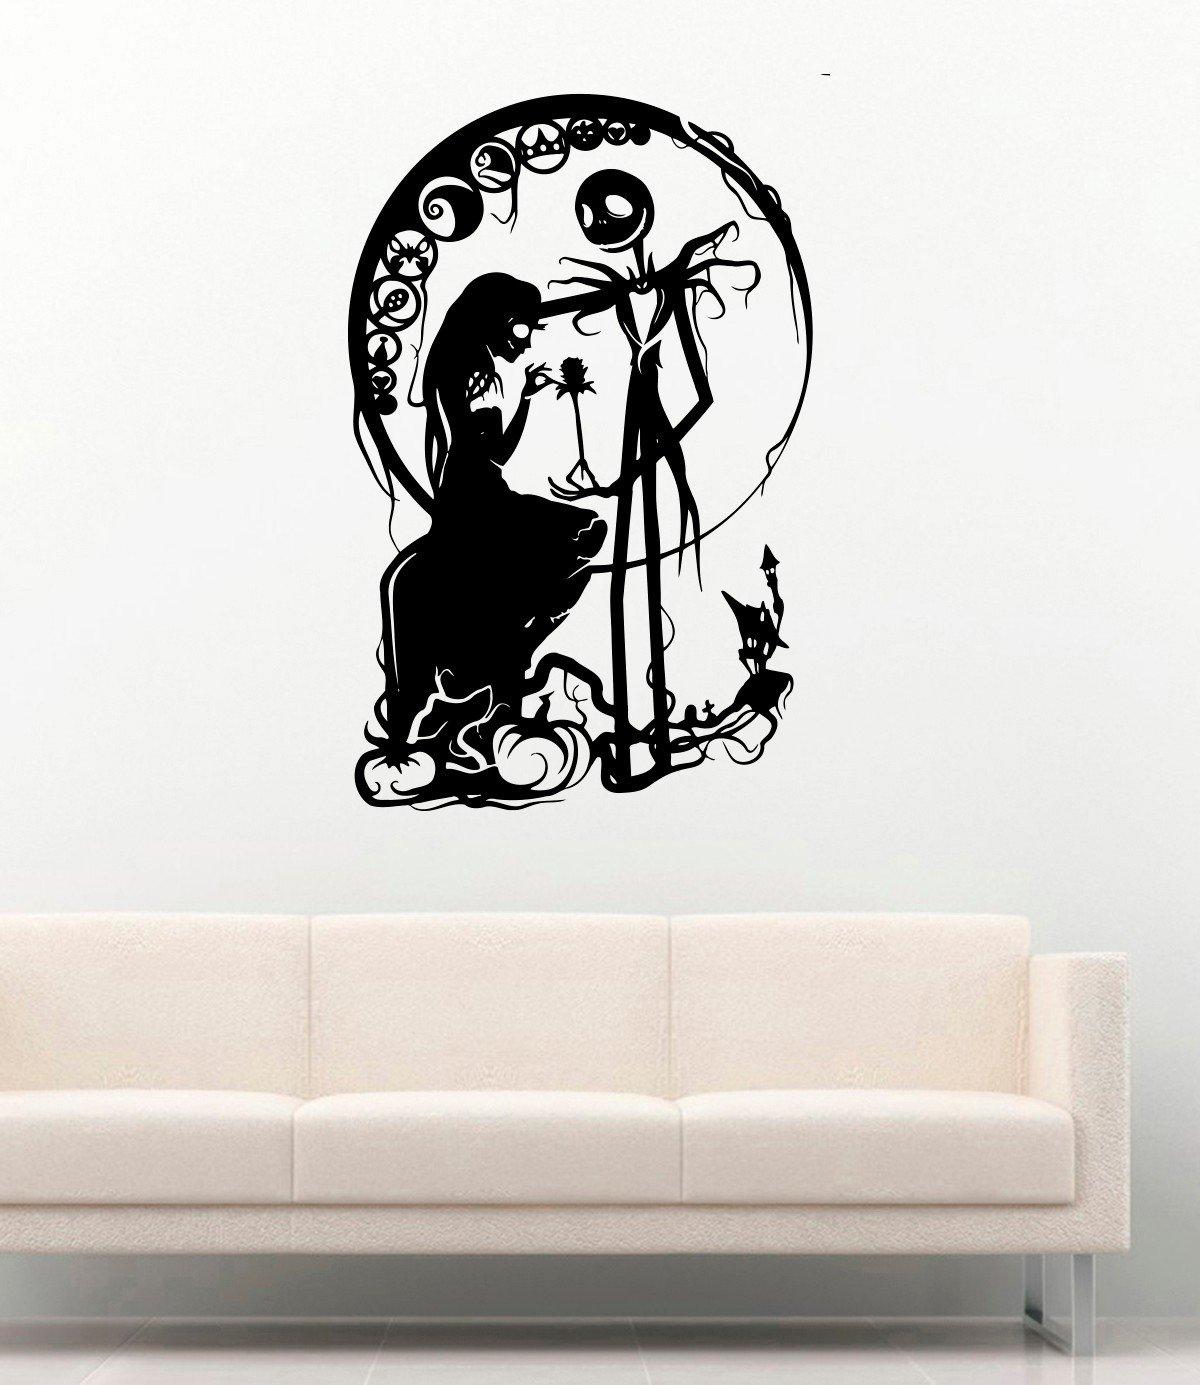 Monster Dead Horror Vinyl Wall Decals Jack Skellington and Girl Silhouette Halloween Decor Stickers Vinyl Mural MK4431